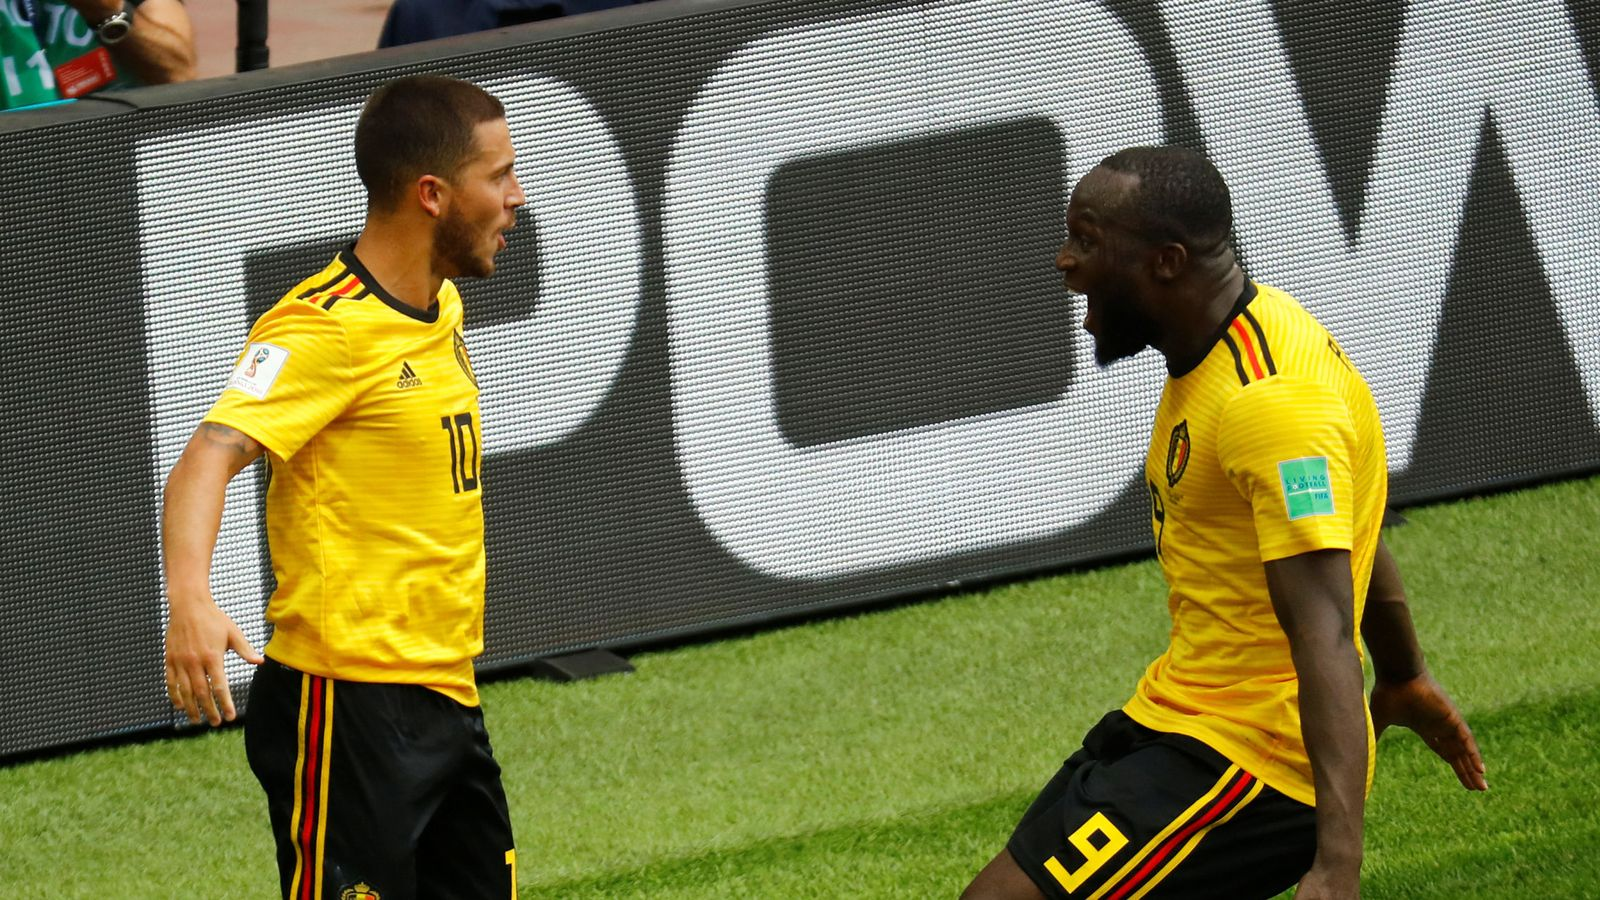 Foto: World cup - group g - belgium vs tunisia